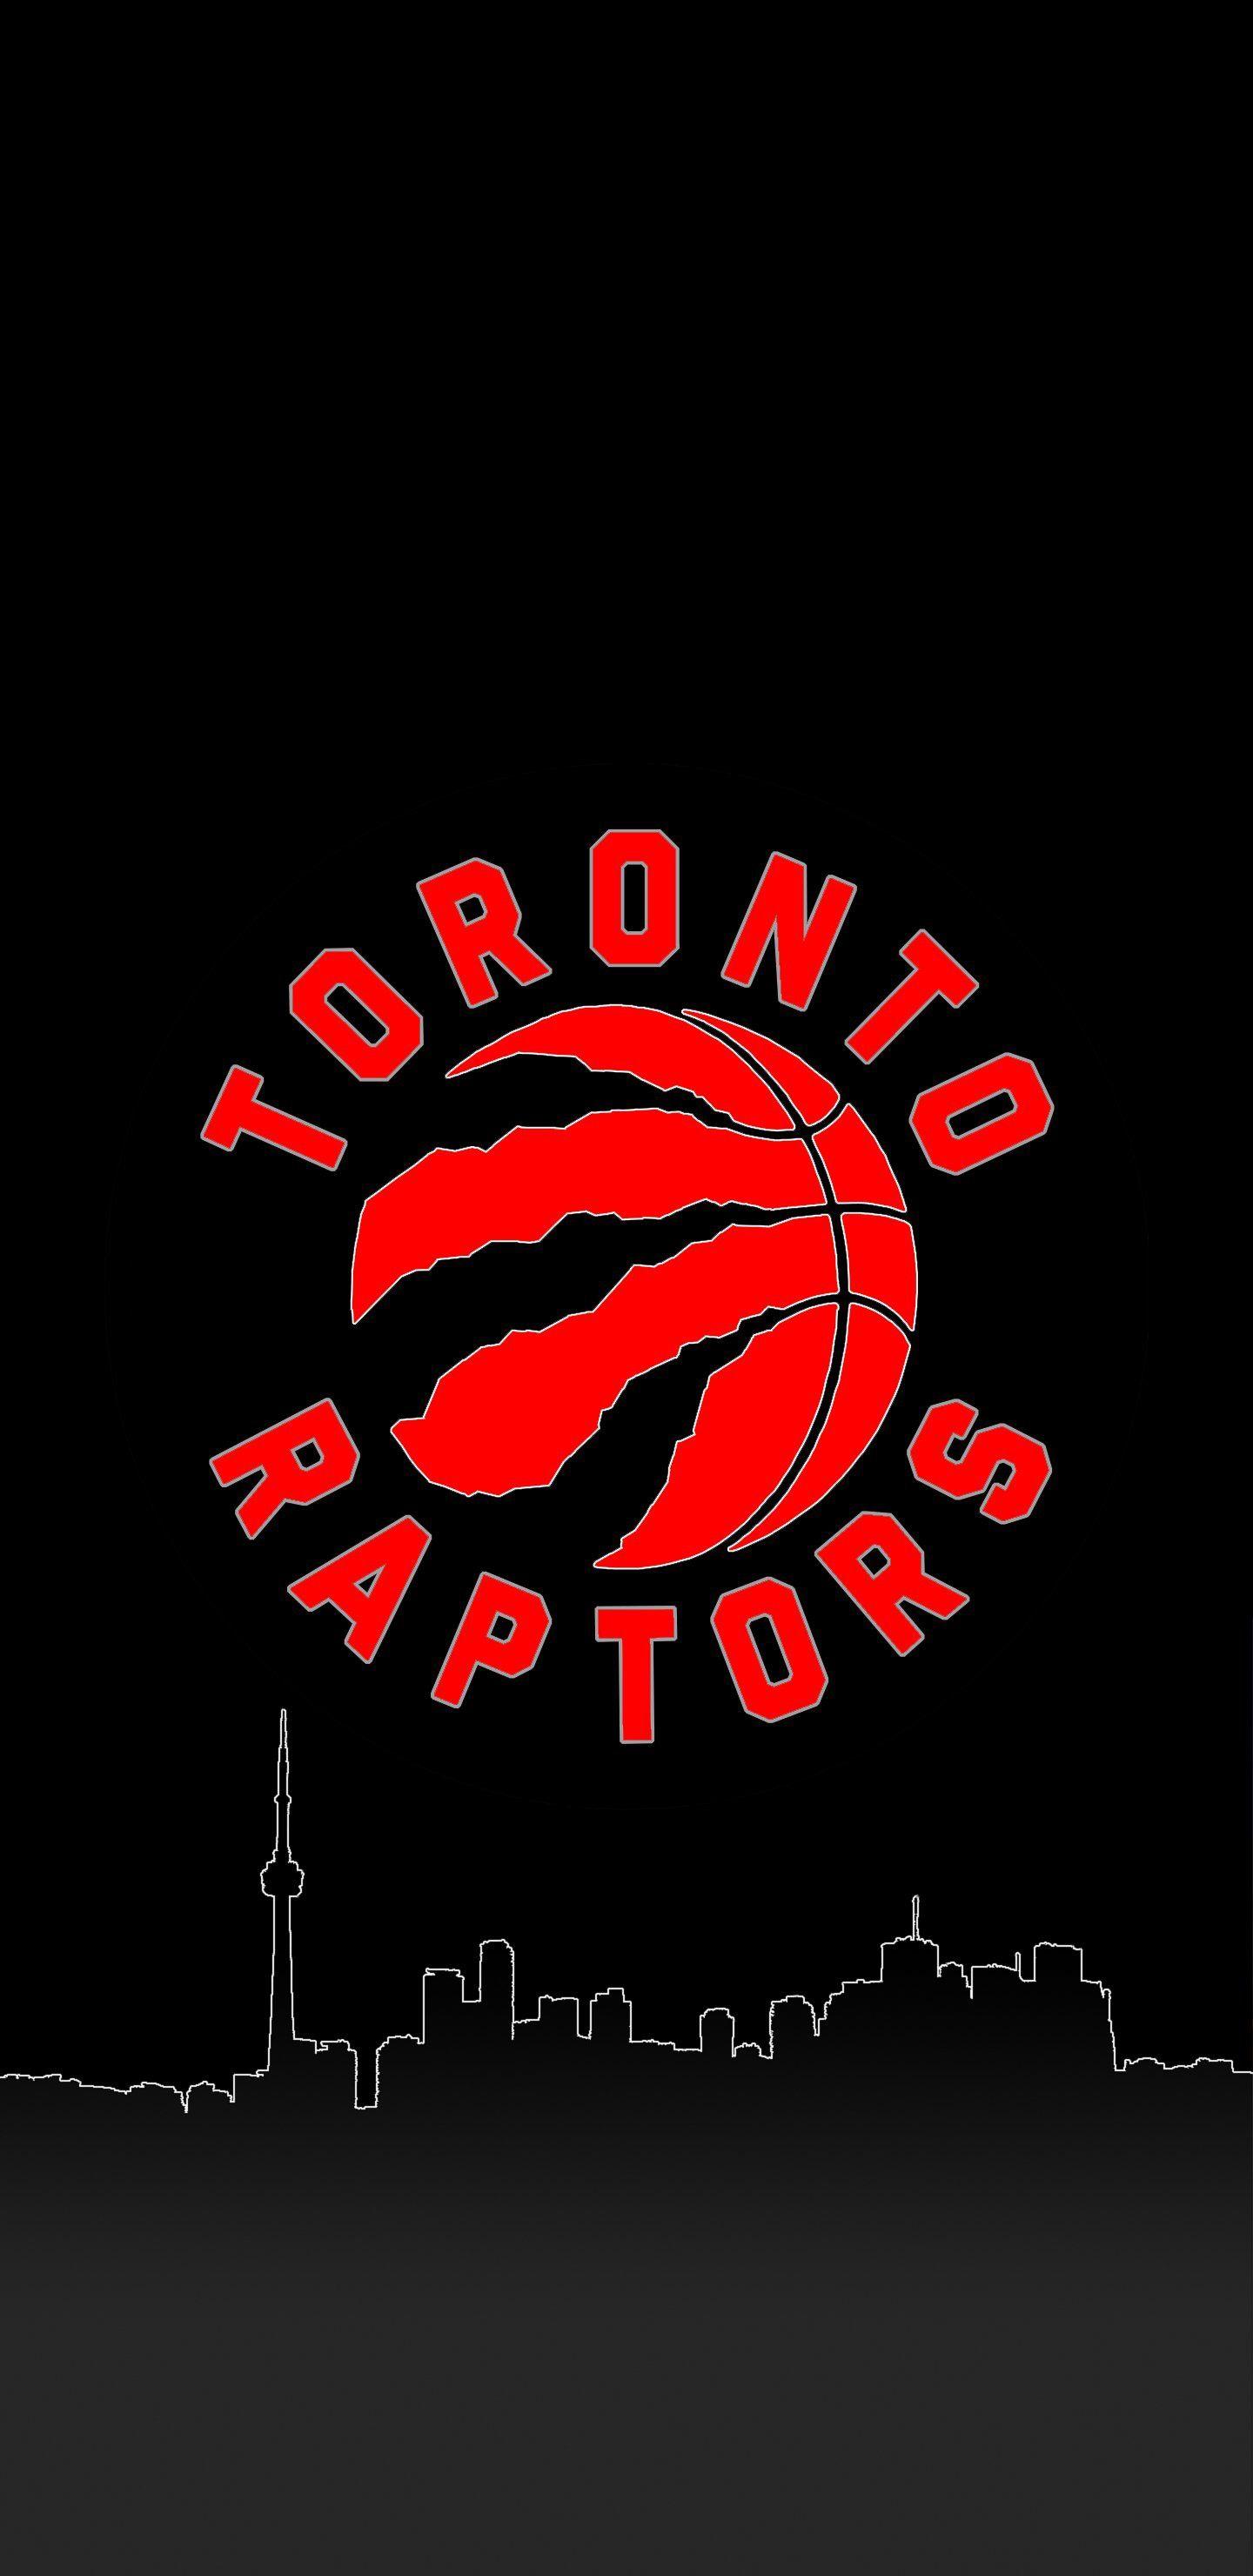 Pin By Jess Flores On Backgrounds Toronto Raptors Basketball Raptors Basketball Nba Sports